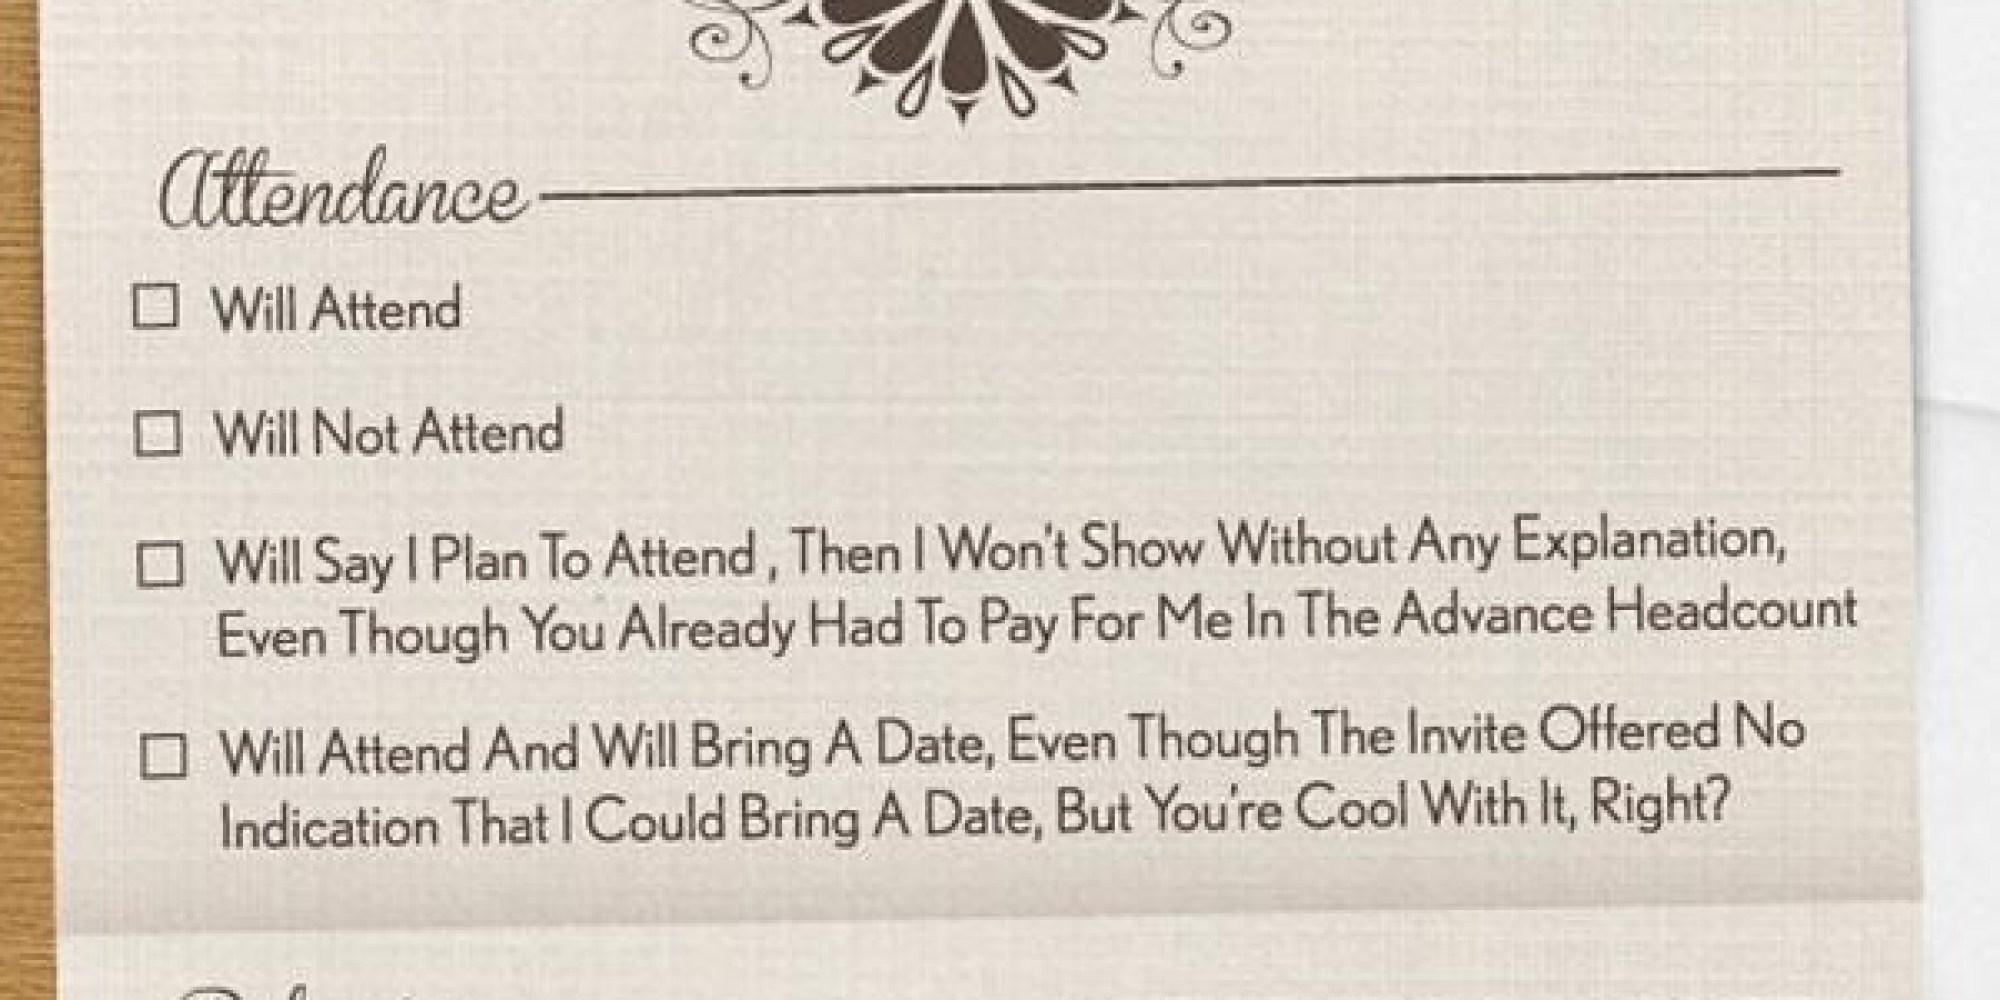 What Should My Wedding Invitation Say: At Last, An Honest Wedding Invitation